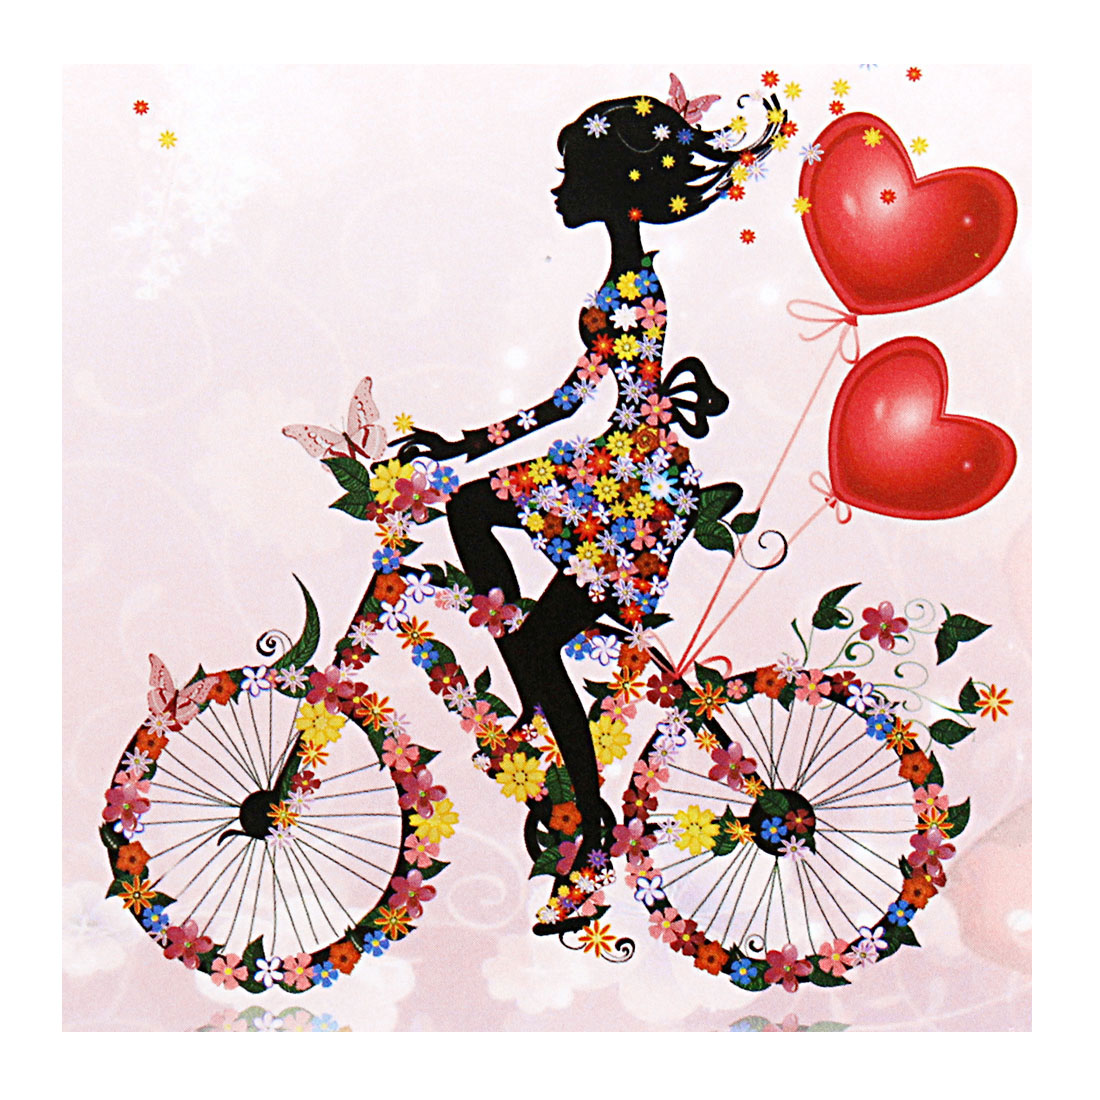 Love Heart Flower Girl Pattern Mural Wall Sticker Removable Art Vinyl Decal DIY